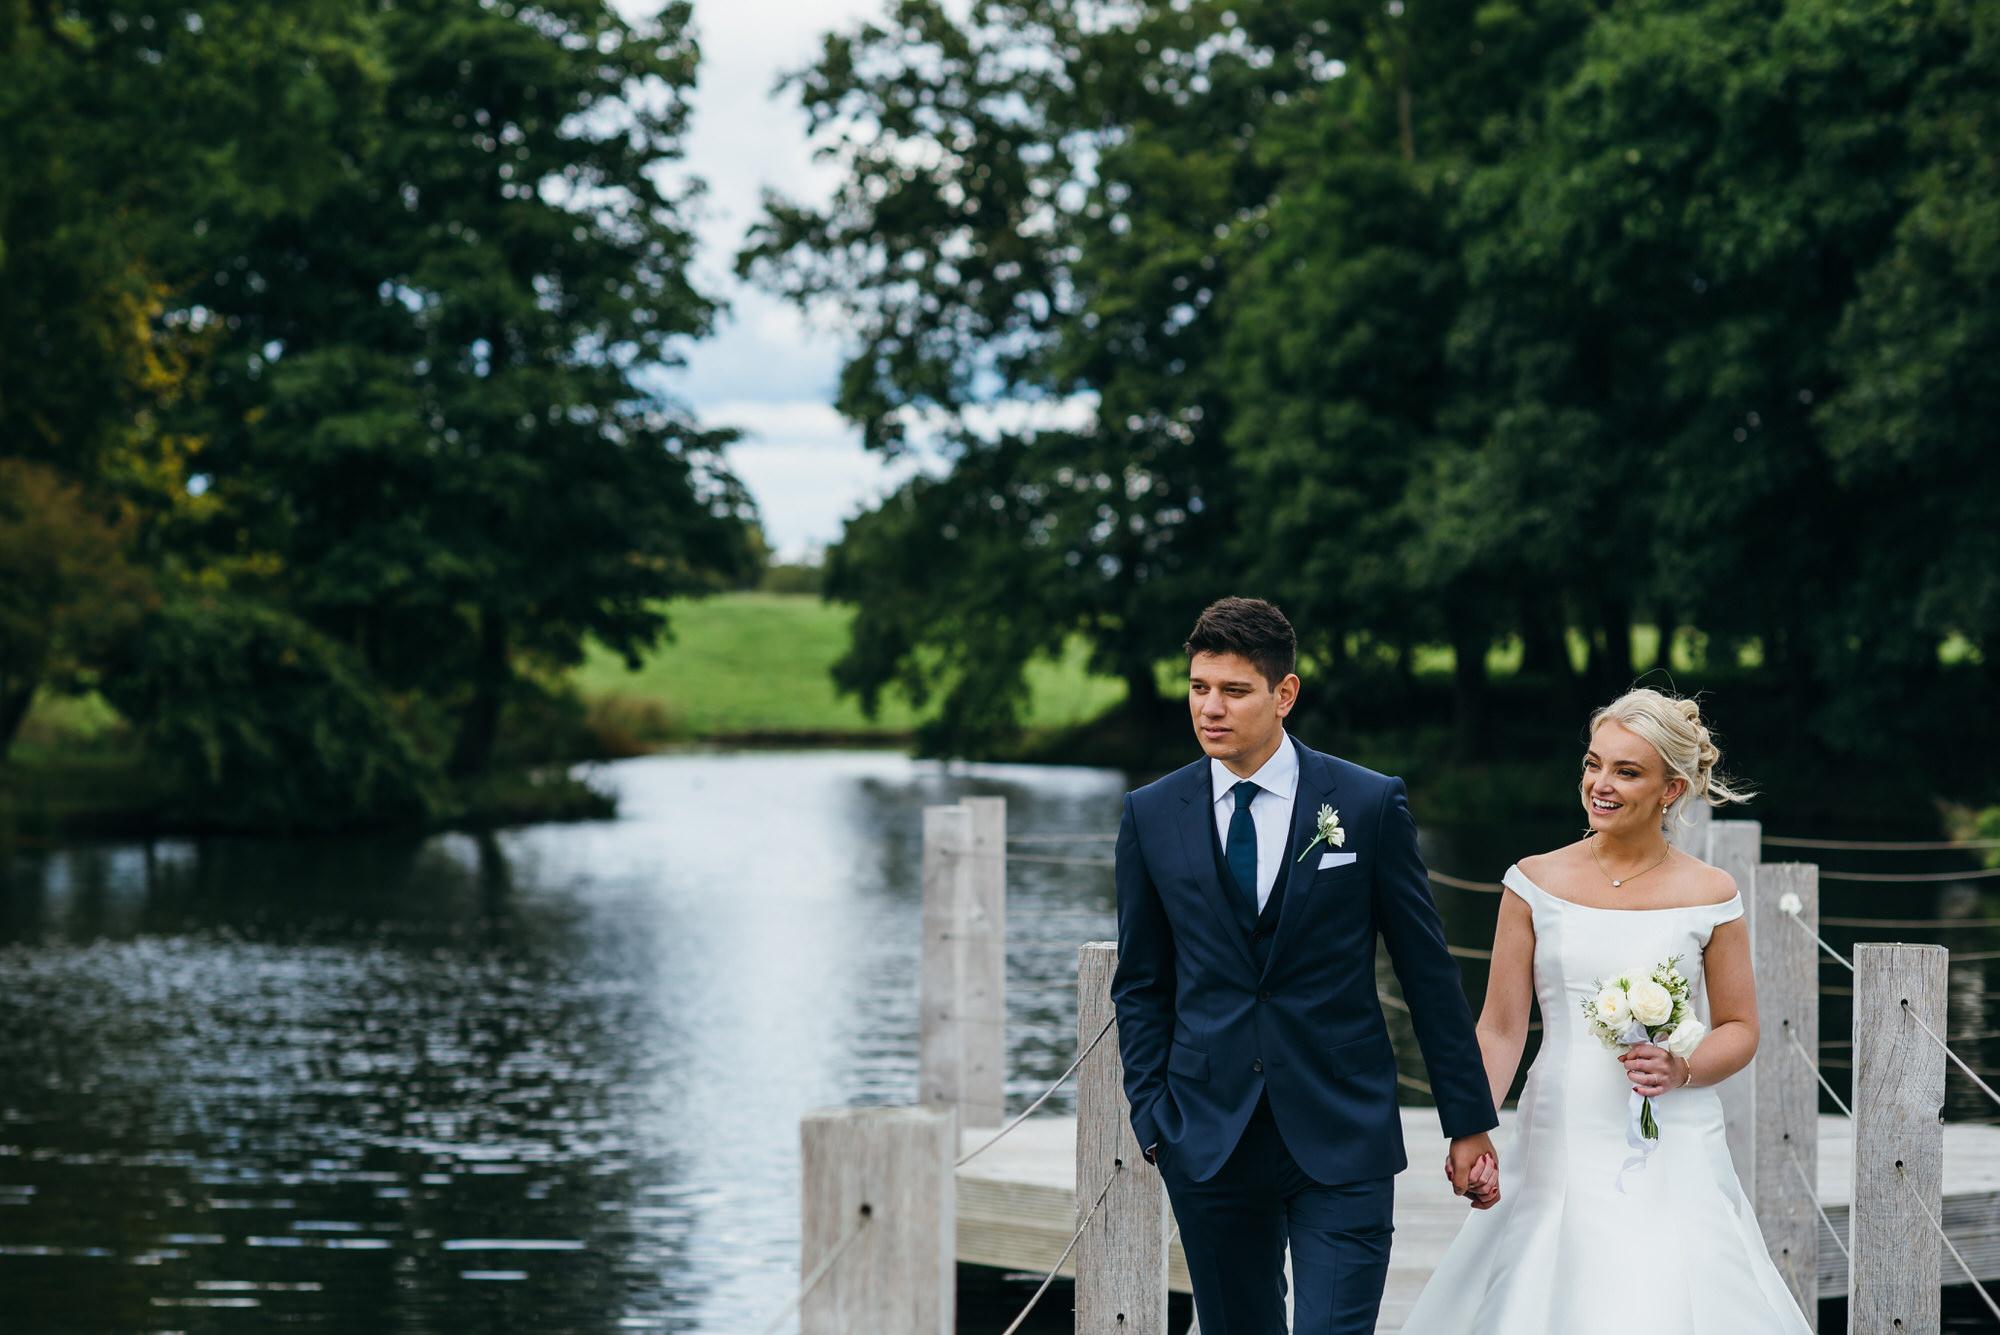 Merrydale manor wedding photography 070